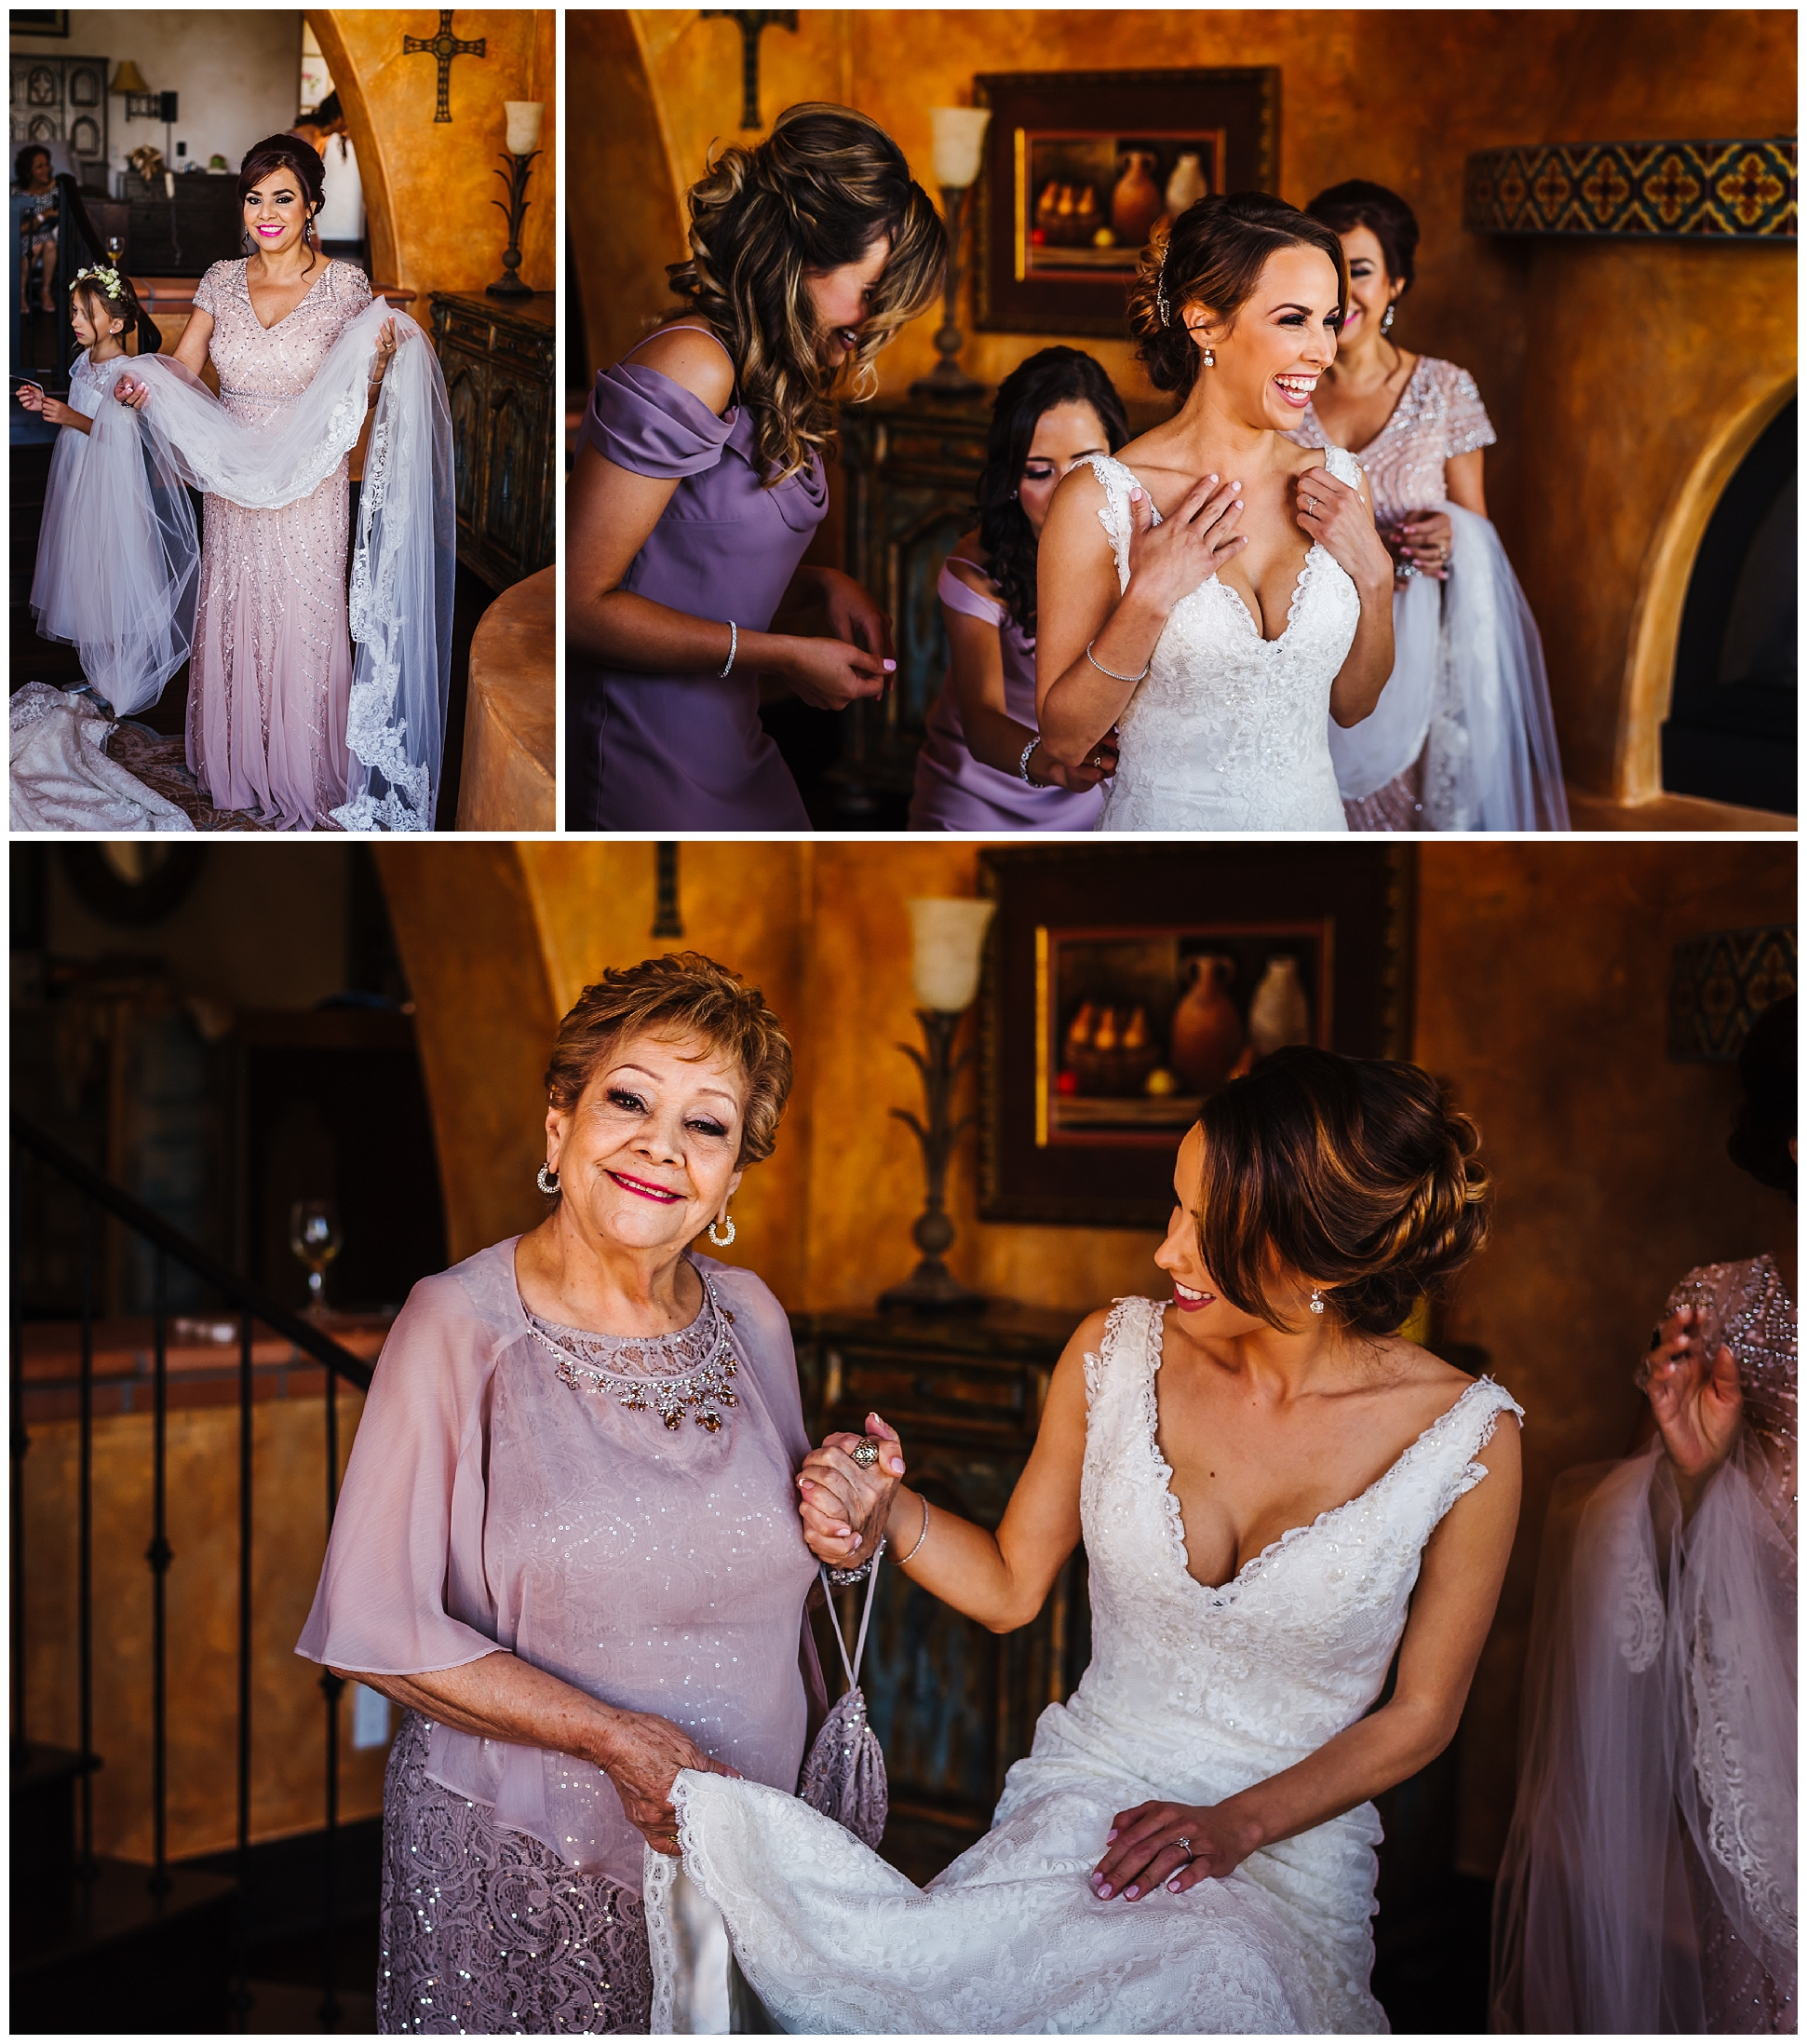 Tampa-luxury-wedding-photographer-mision-lago-private-estate_0010.jpg